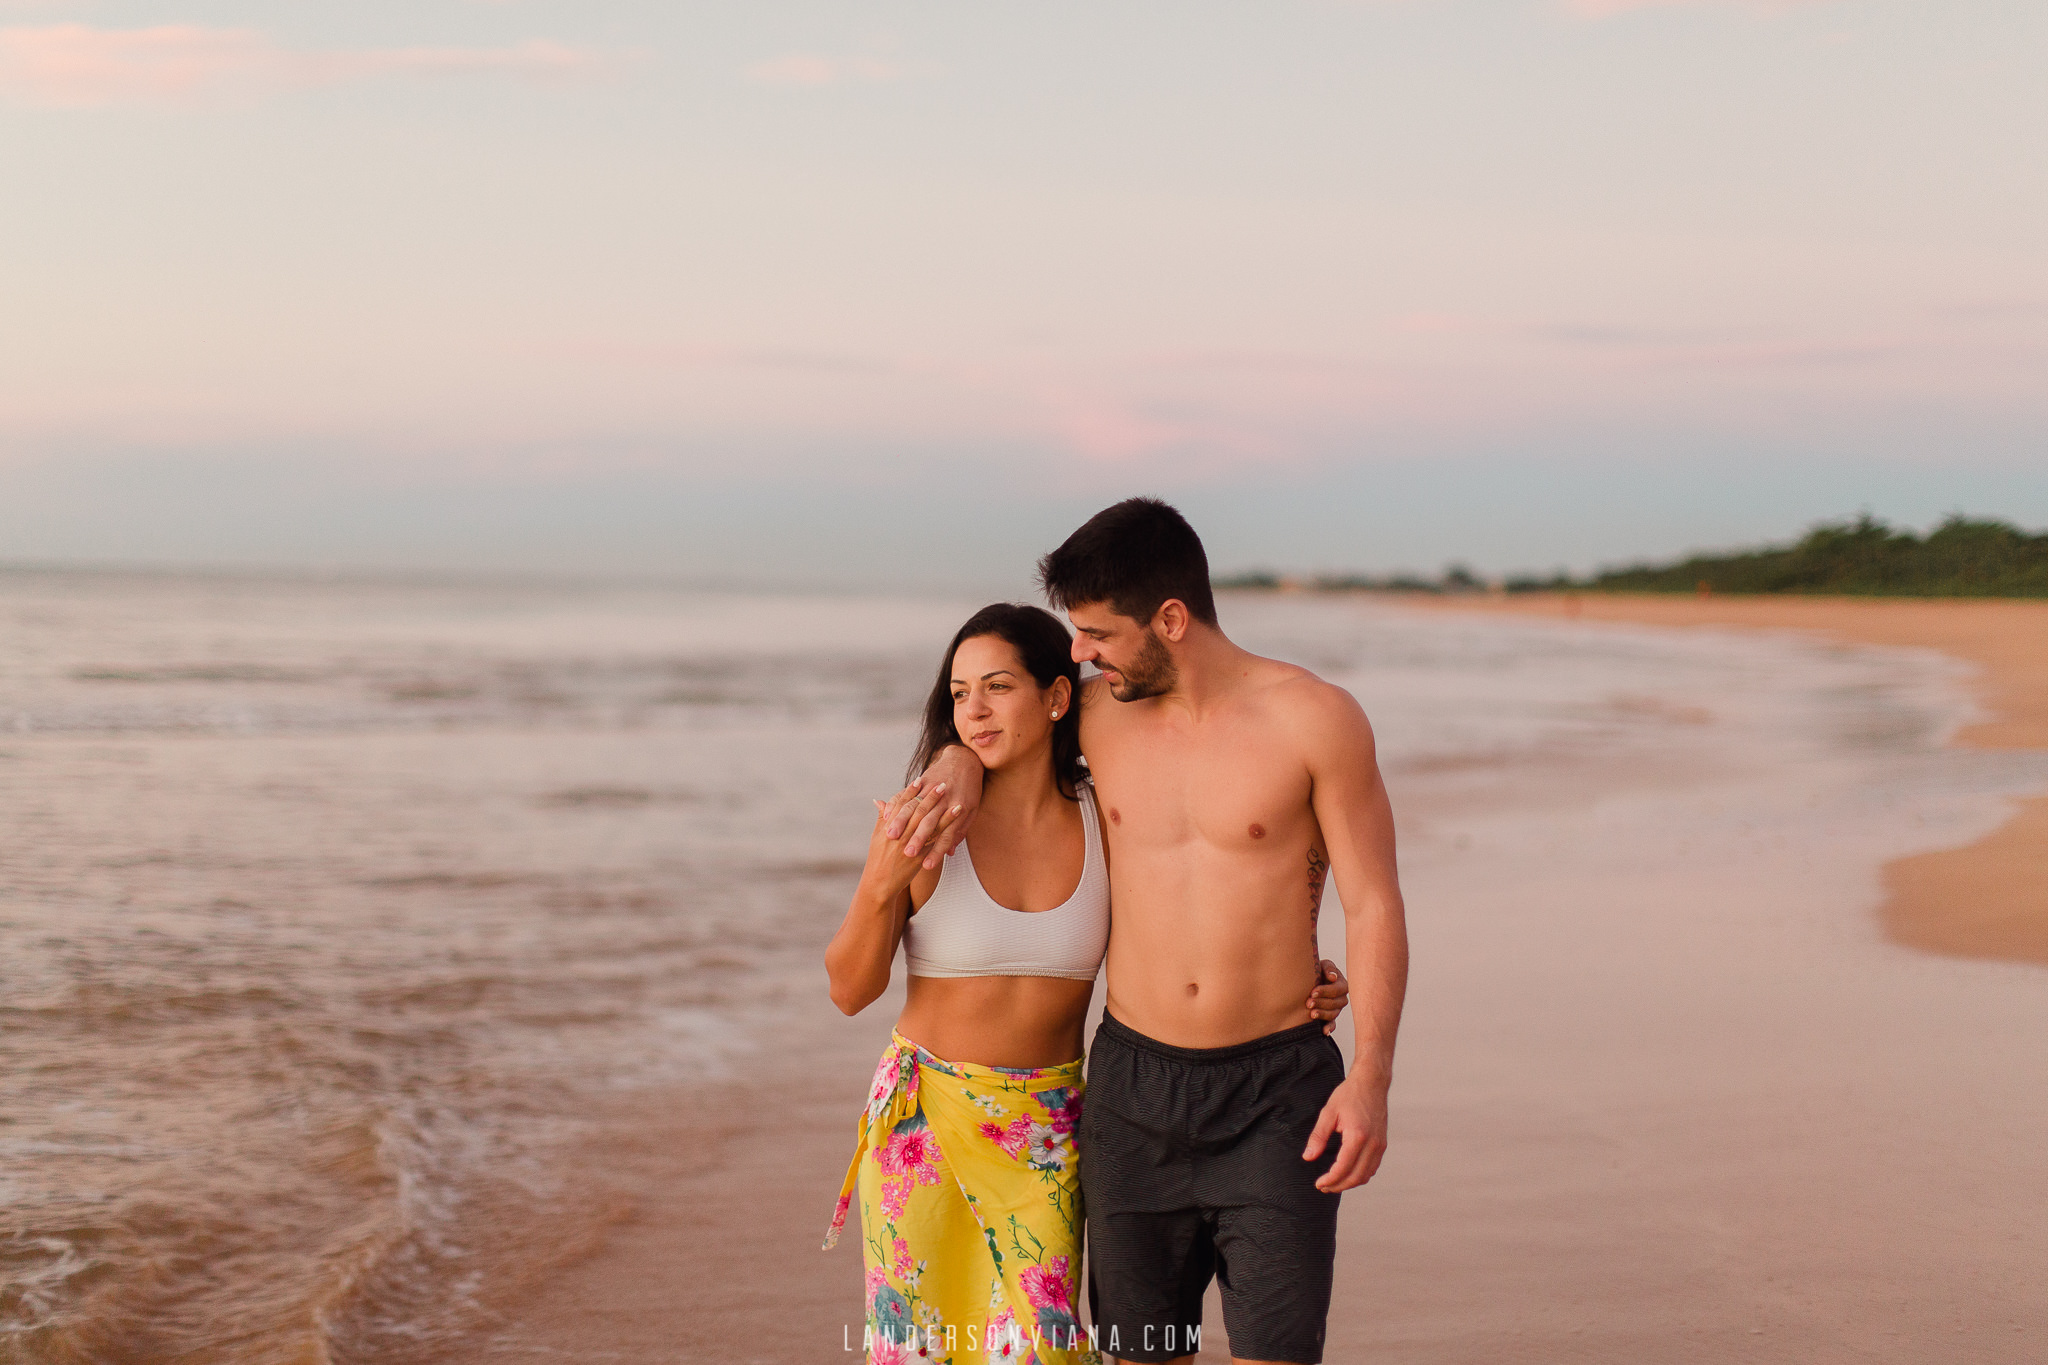 ensaio-pre-wedding-praia-landerson-viana-fotografia-casamento-pegueiobouquet-54.jpg